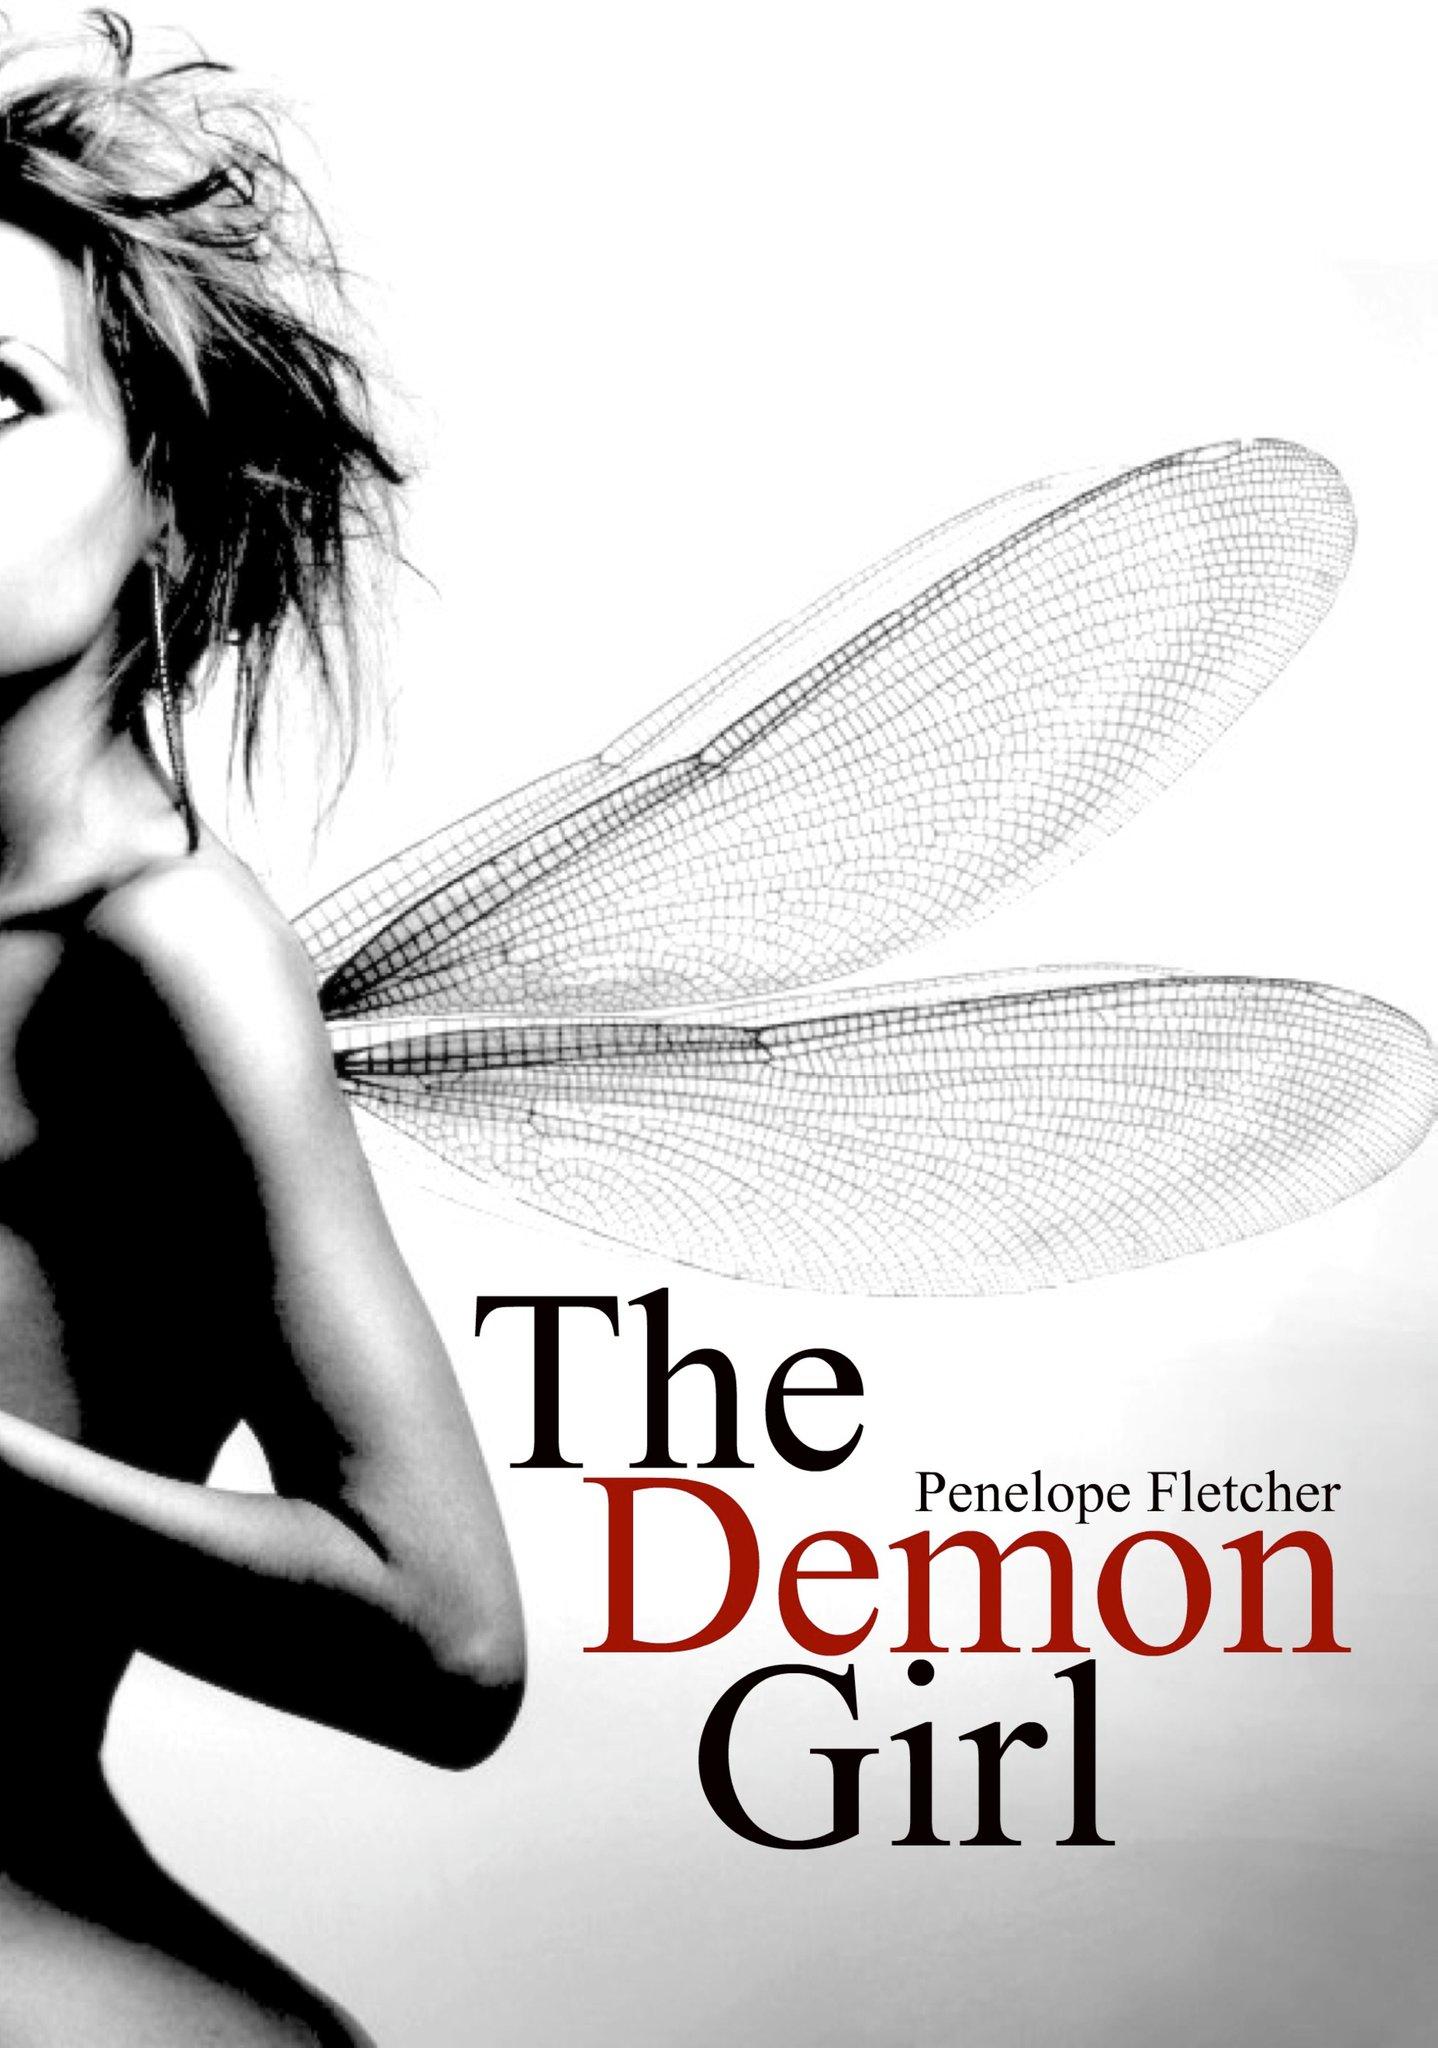 The Demon Girl